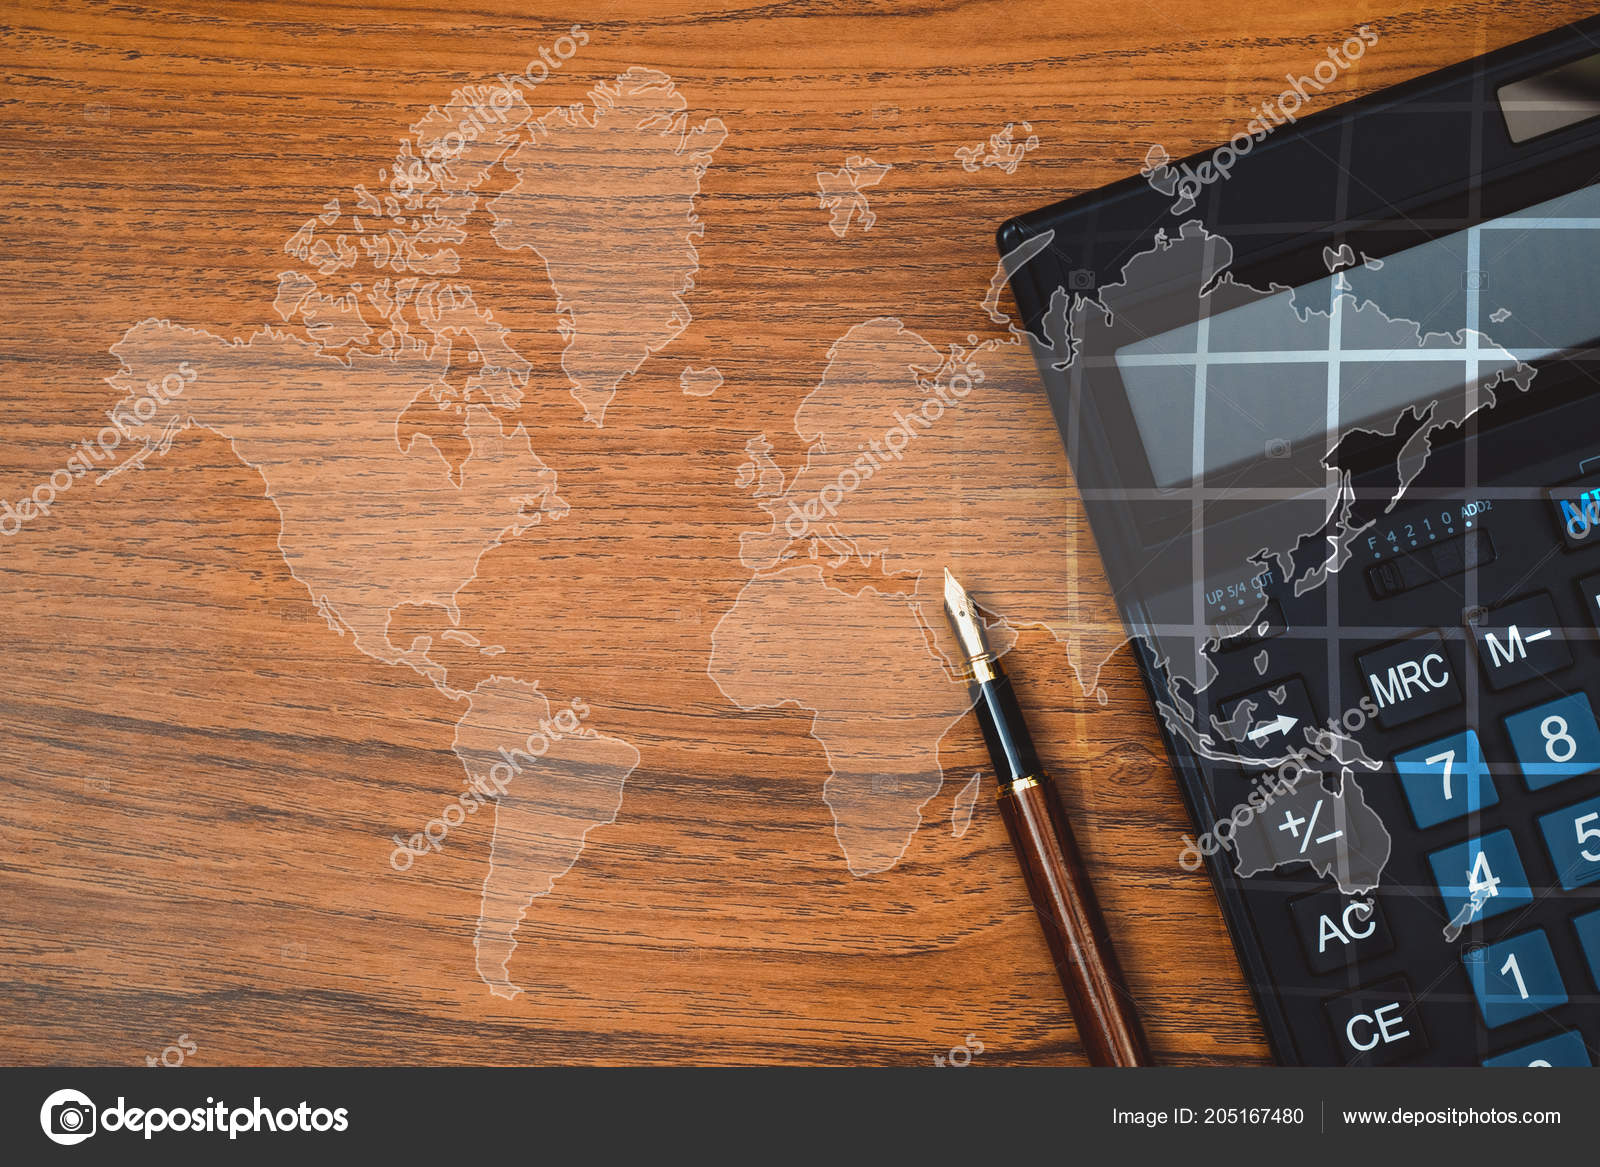 Double exposure fountain pen ink pen calculator table world map double exposure of fountain pen or ink pen with calculator on table with world map office desk concept idea element by nasa photo by pookpiik gumiabroncs Images